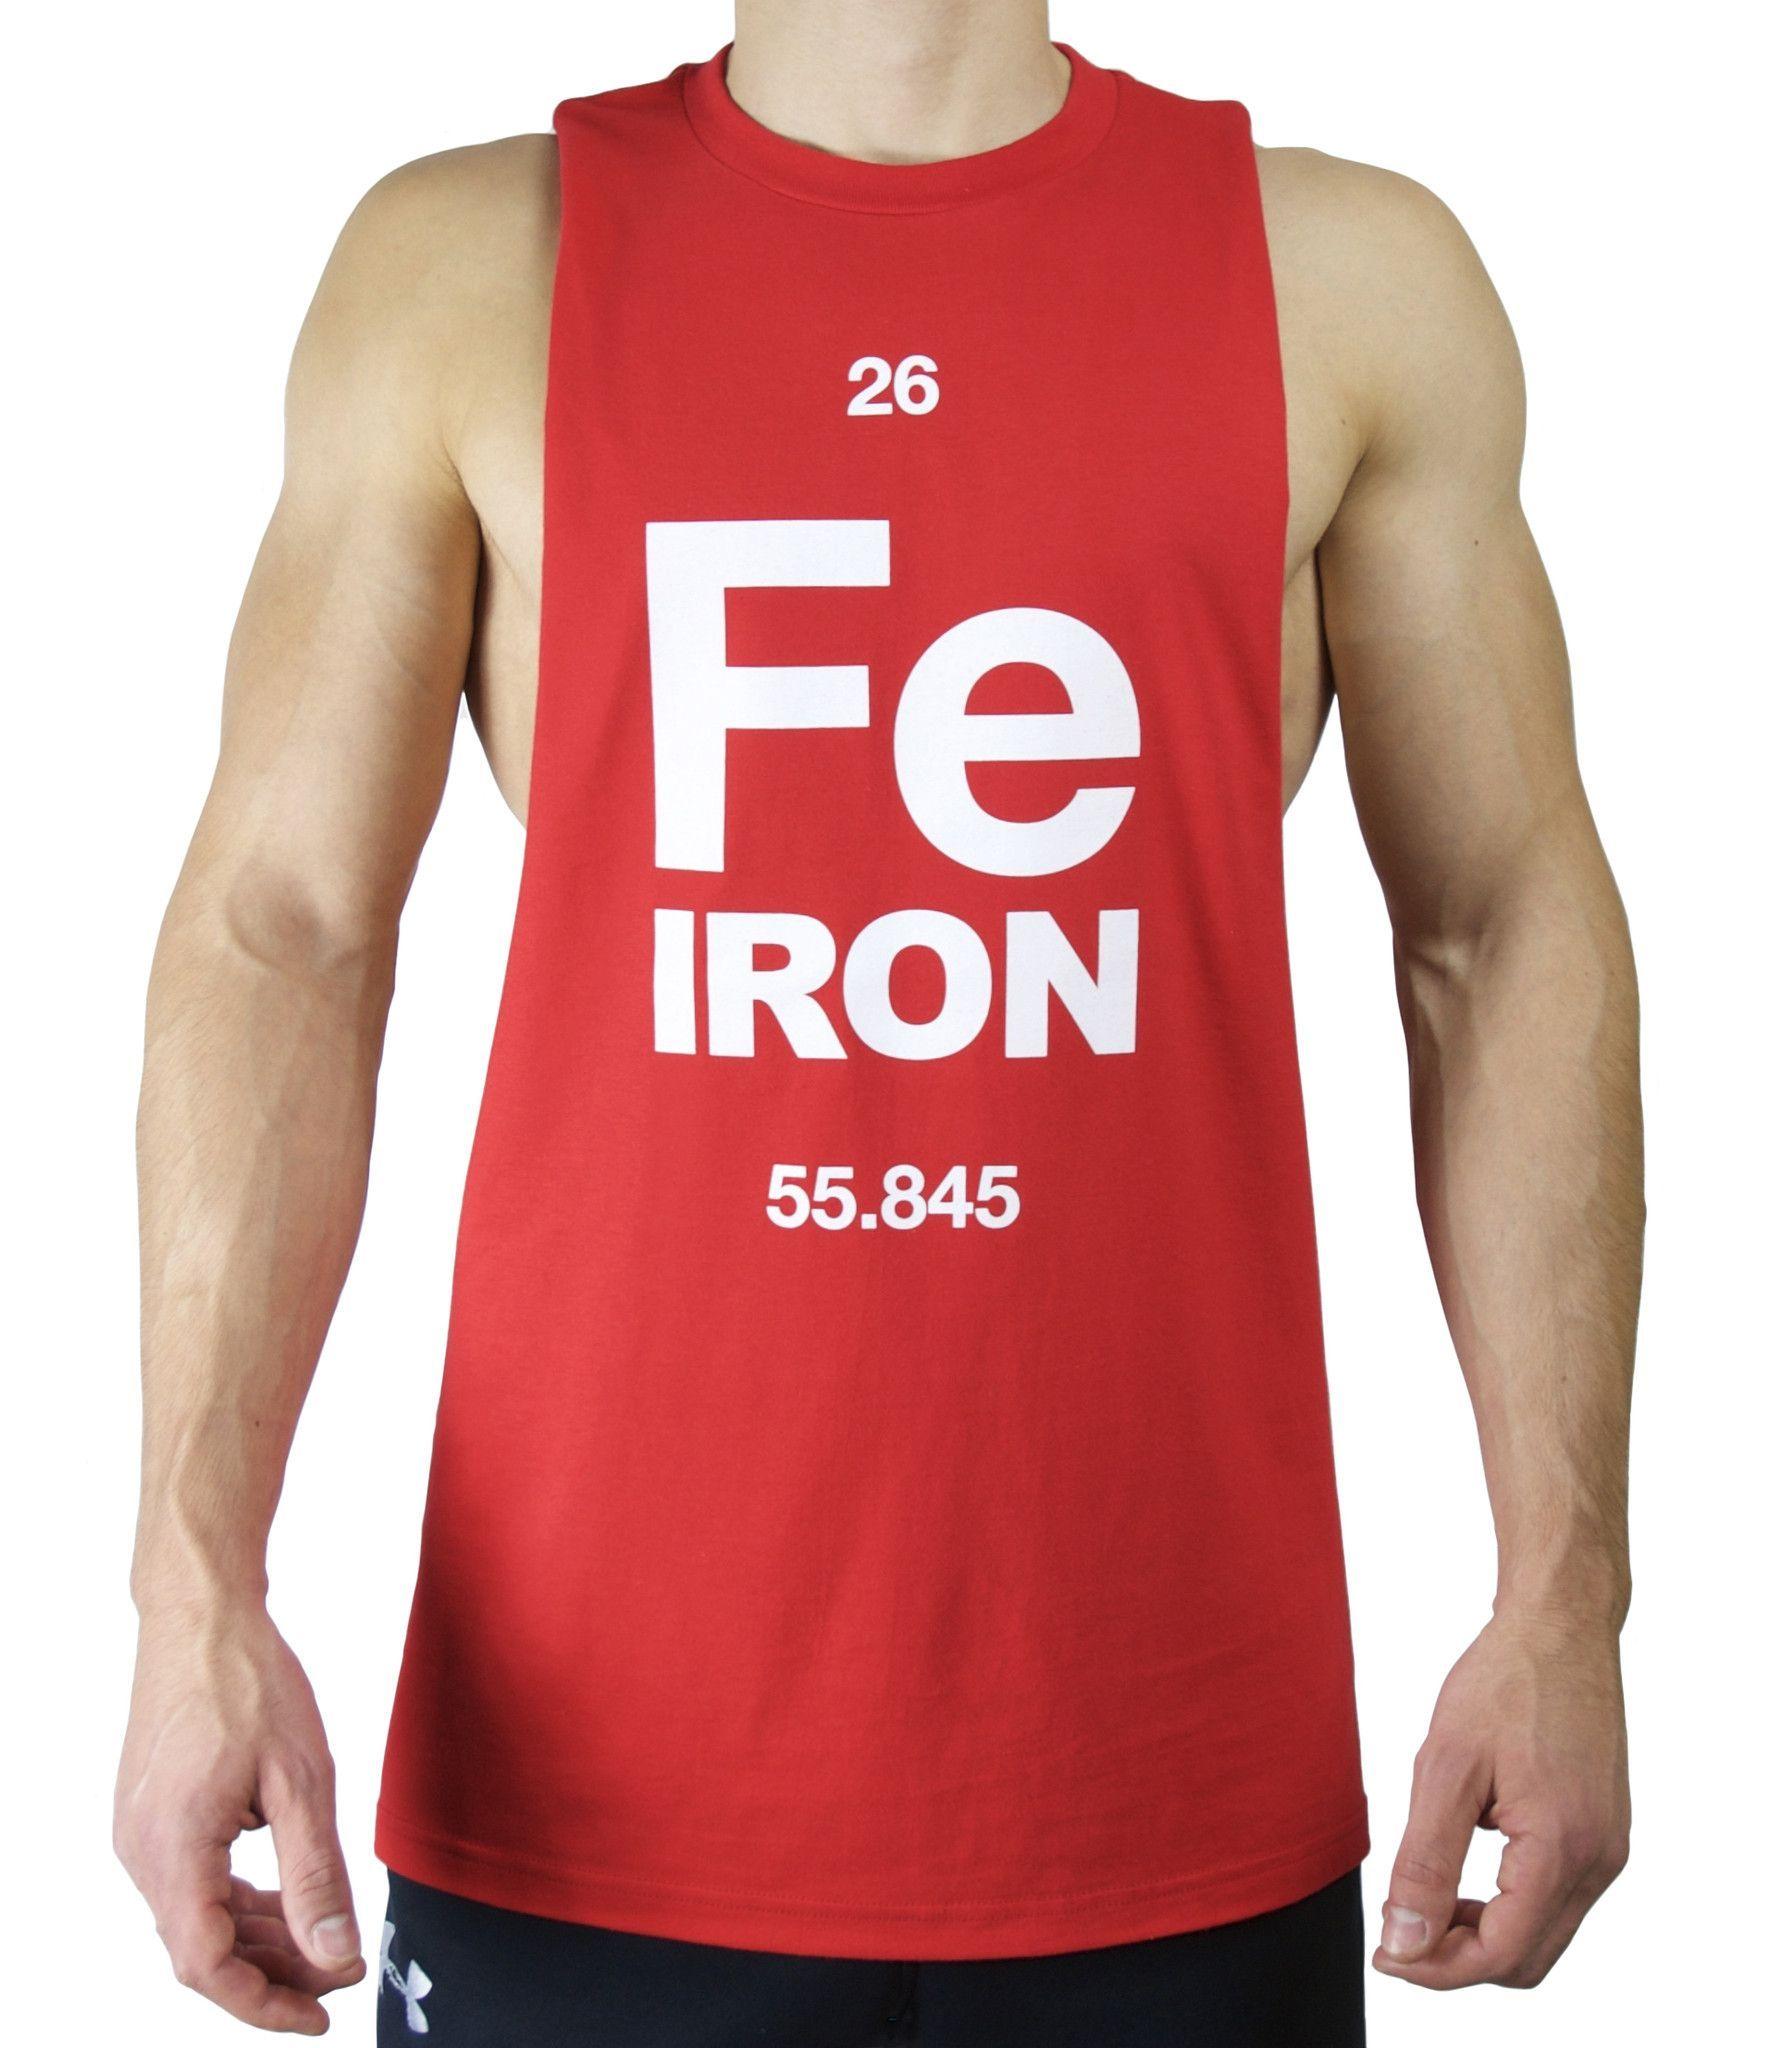 81188125 Sleeveless Sideless Muscle Gym Workout Singlet Tank Top Shirt Repps Apparel  Mens